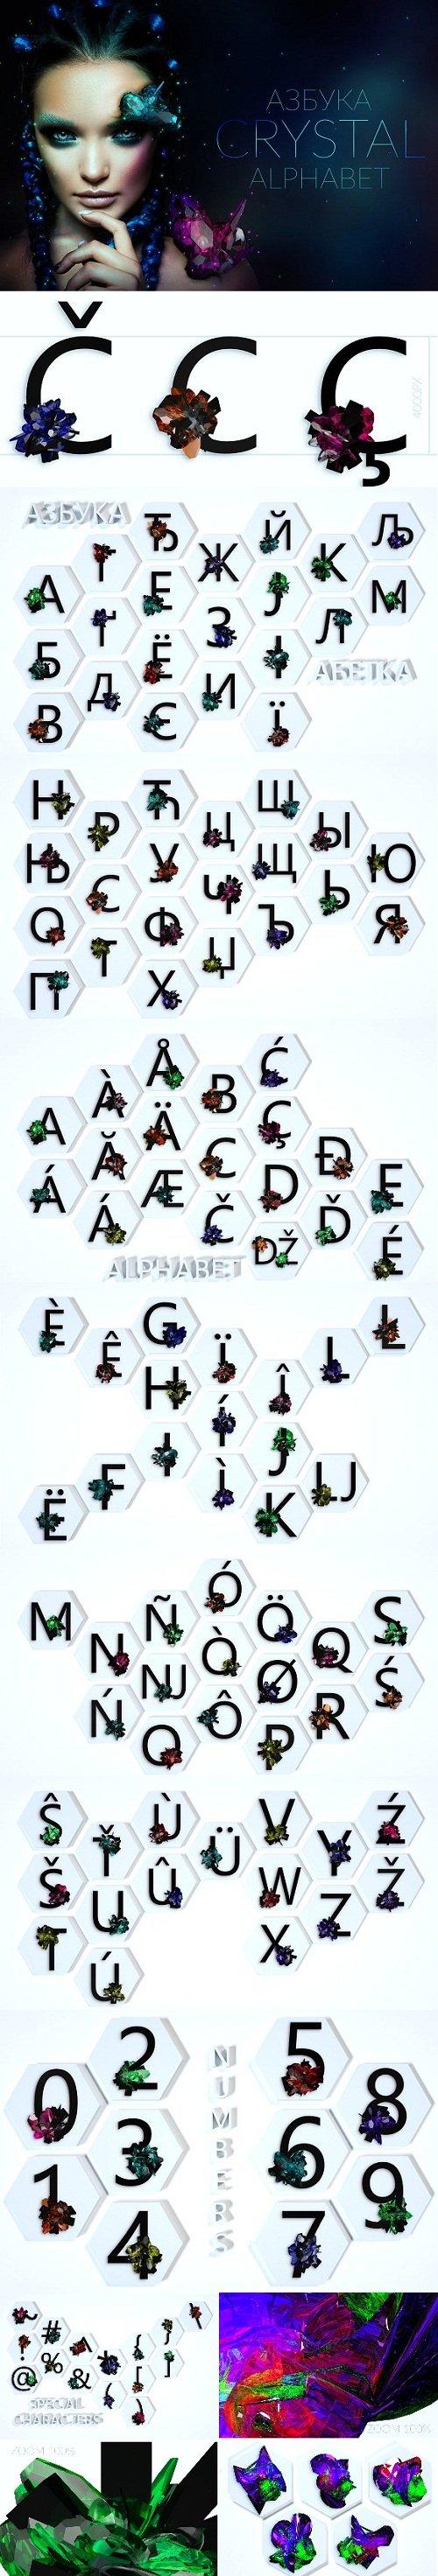 Crystal | Азбука | Alphabet - 3338495